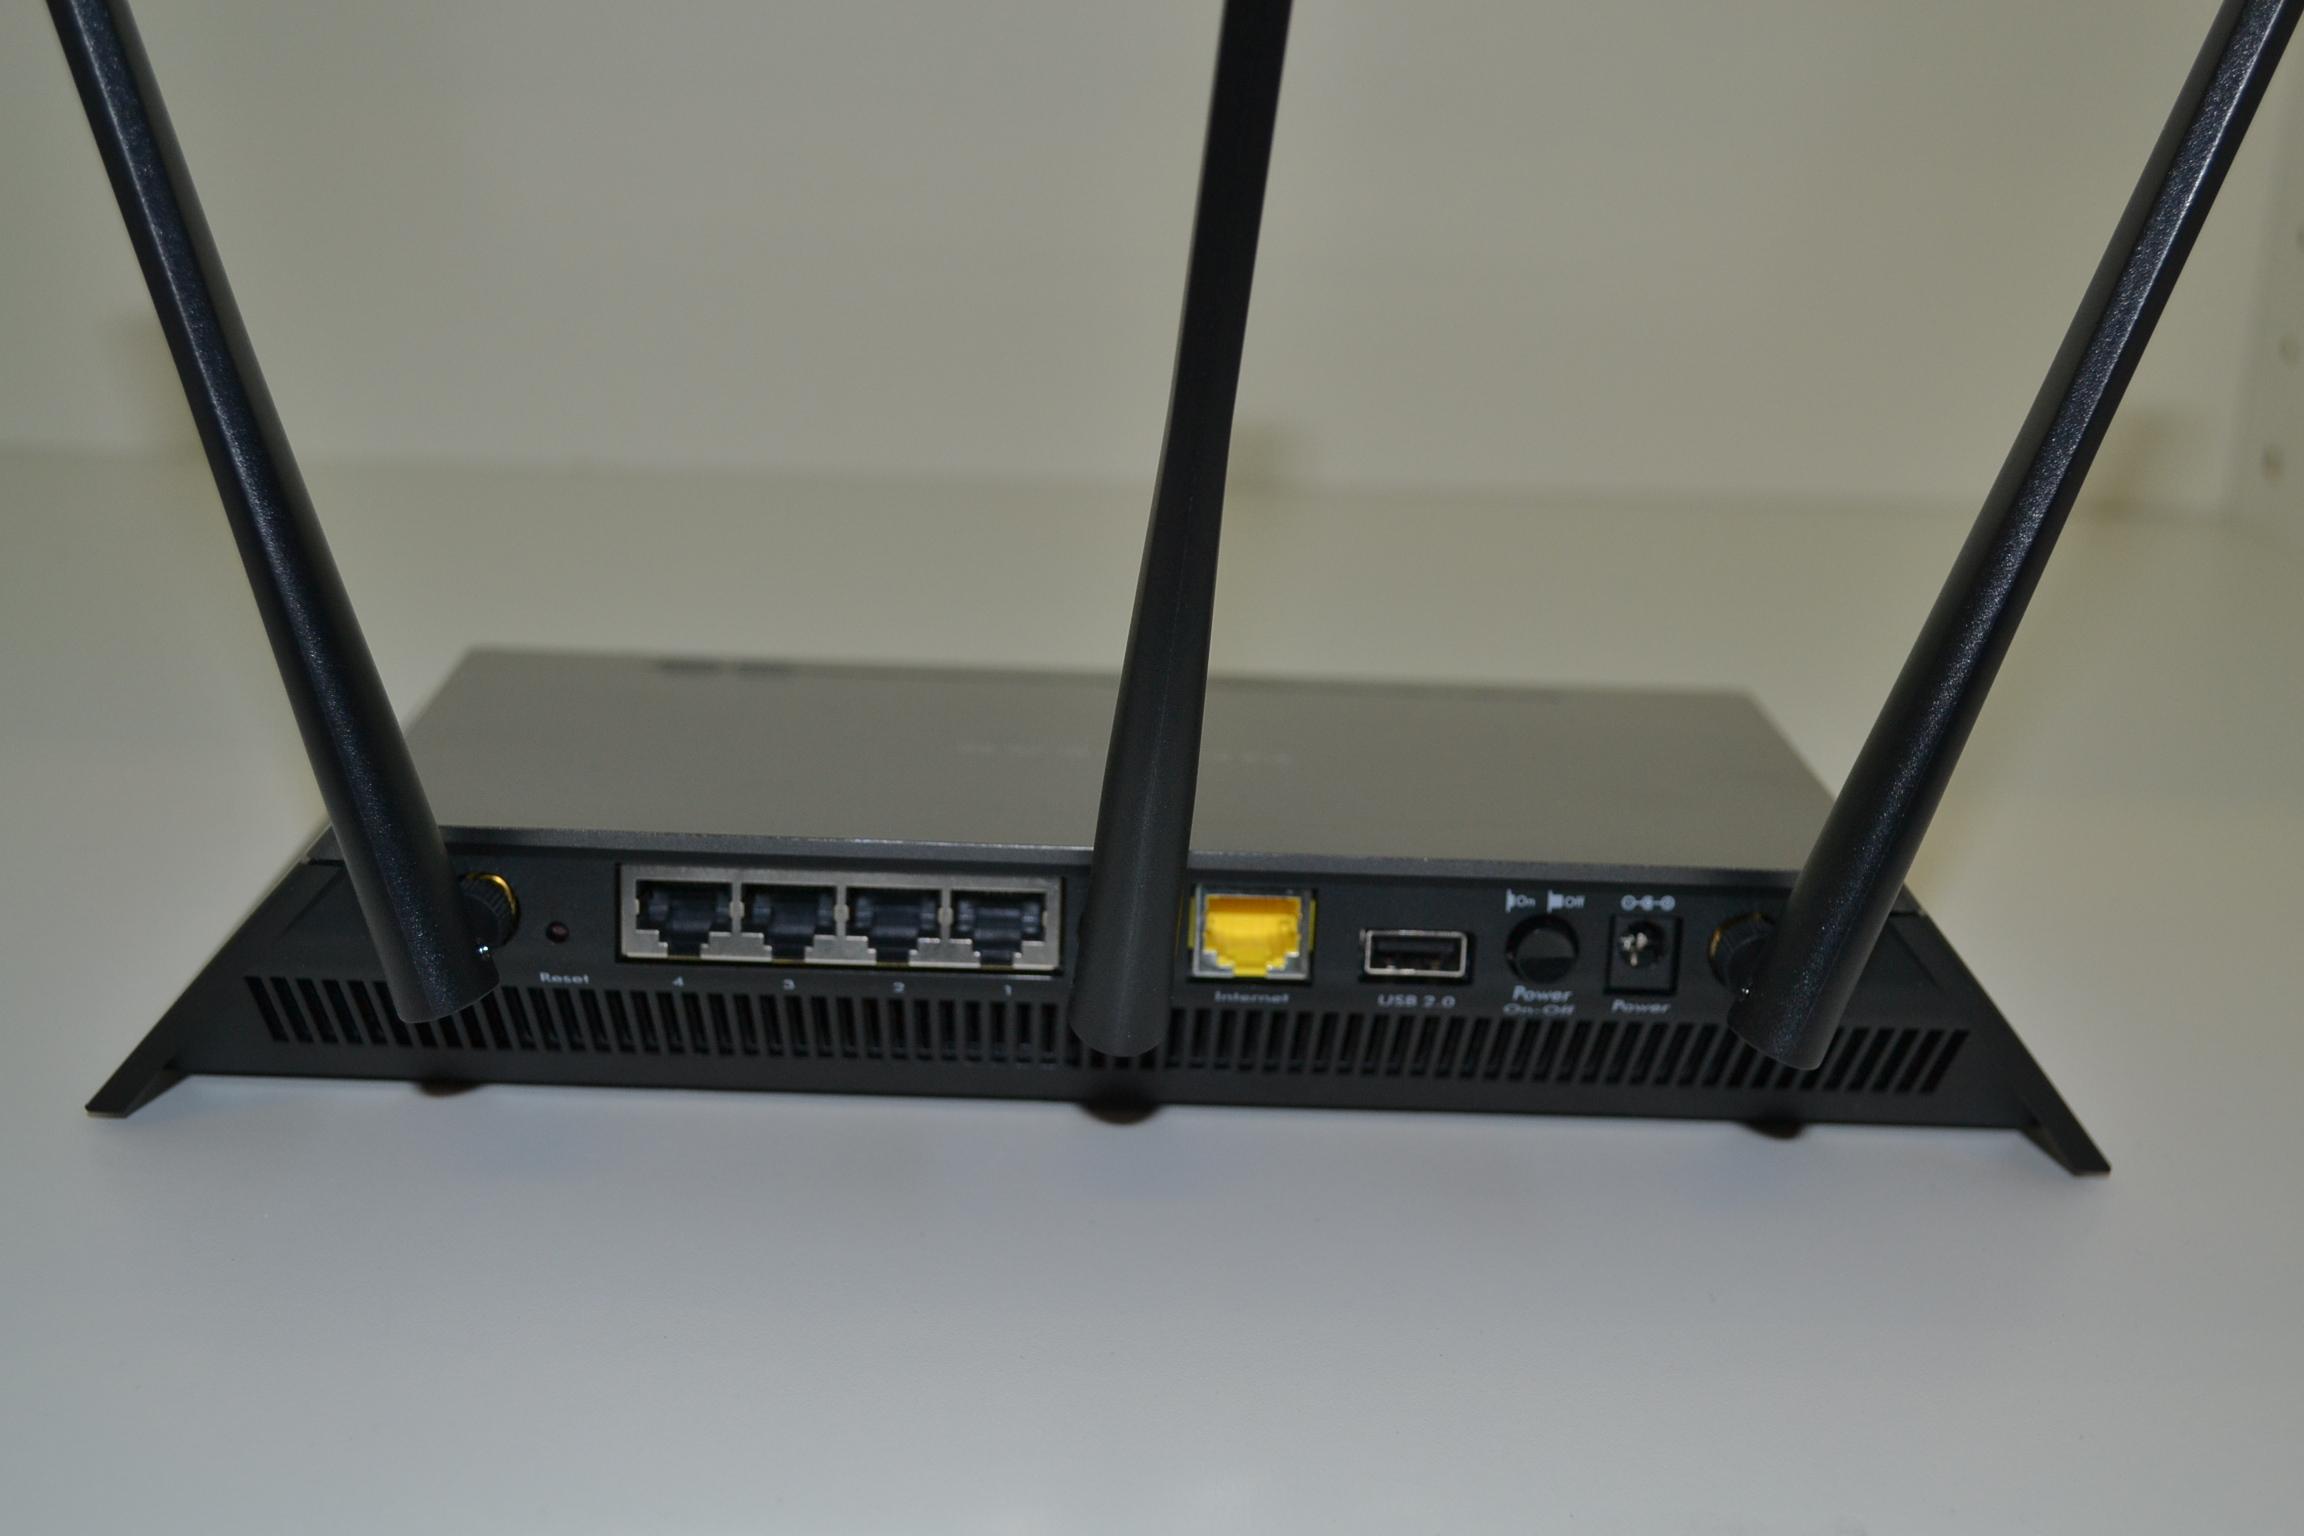 Netgear Nighthawk AC1900 Dual Band Wi-Fi Gigabit Router ...